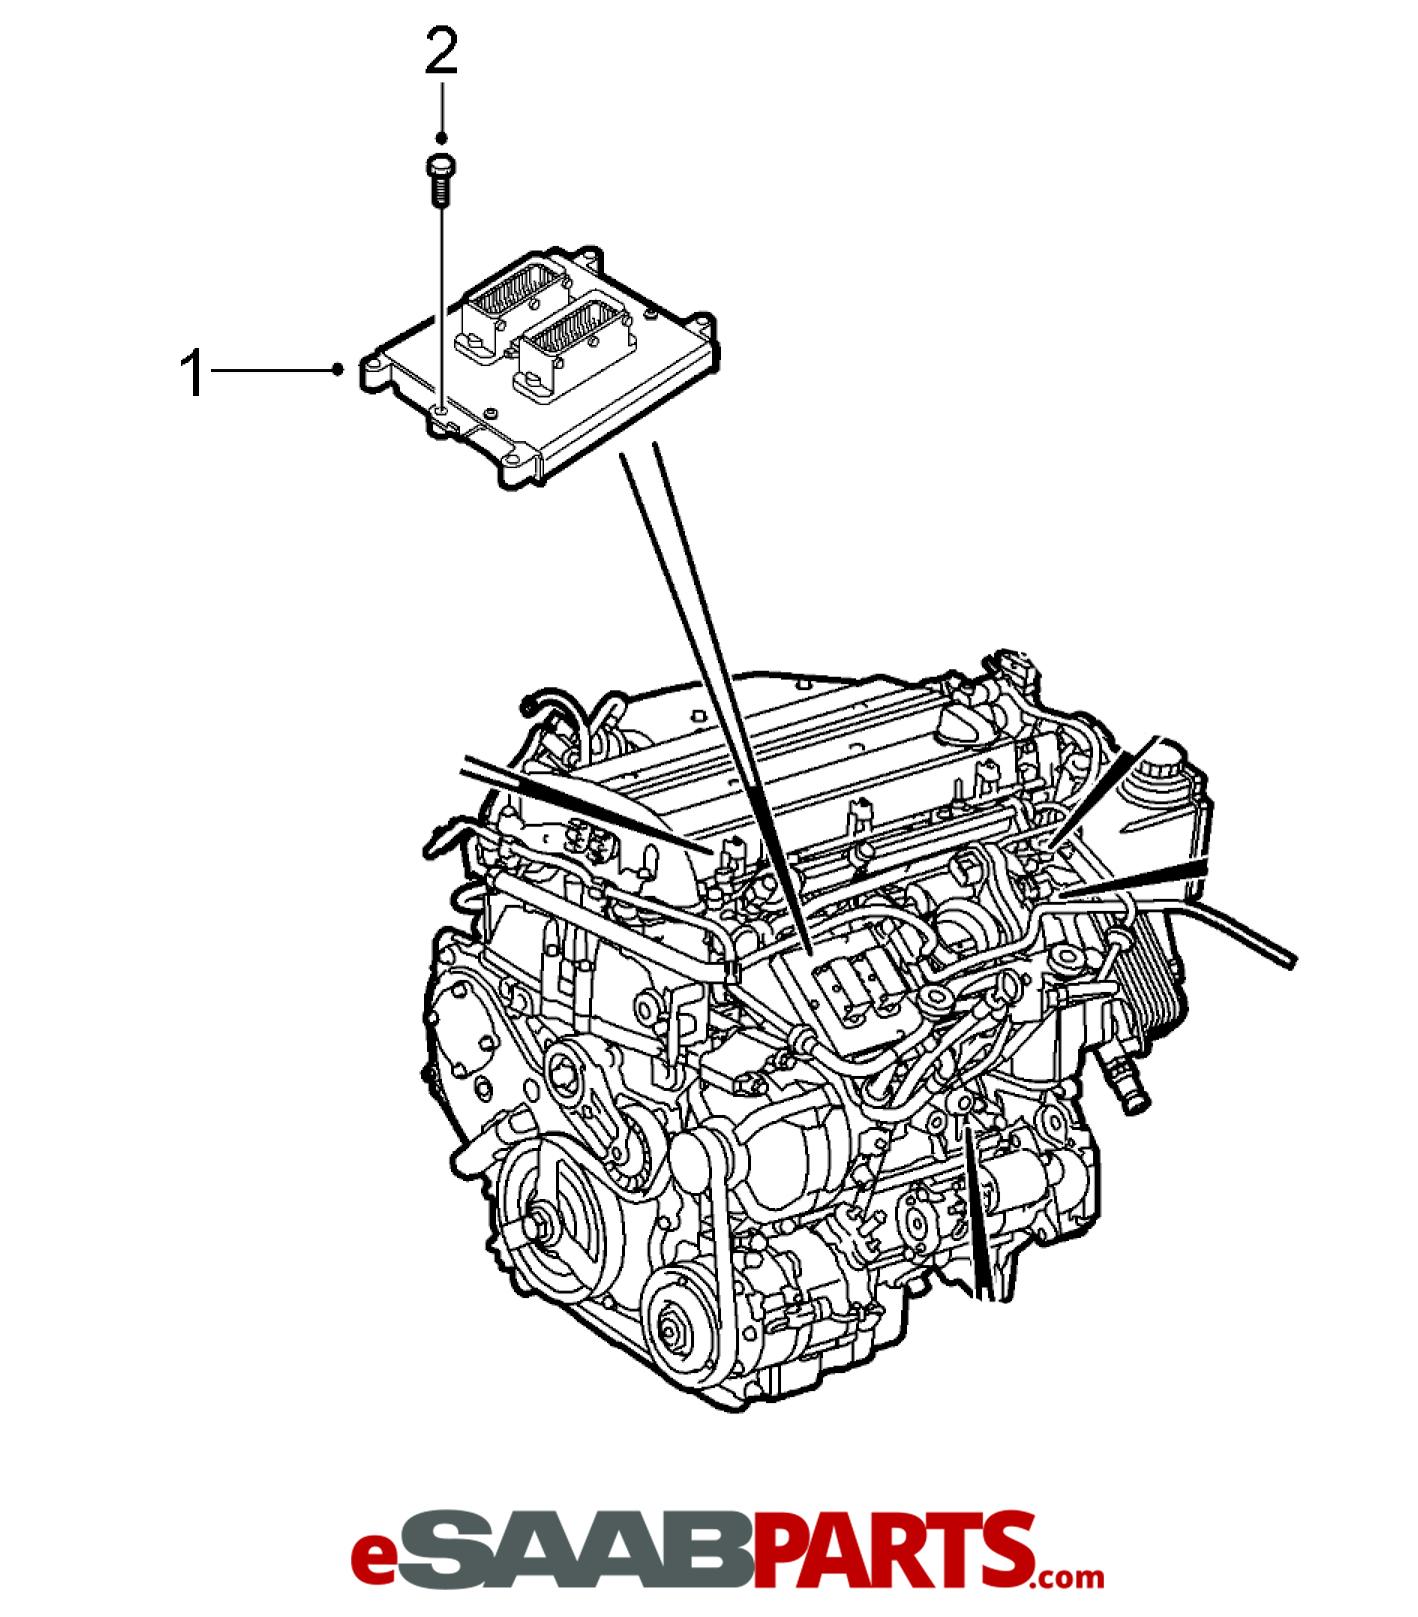 hight resolution of esaabparts com saab 9 3 9440 electrical parts ecm tcm engine control module ecm